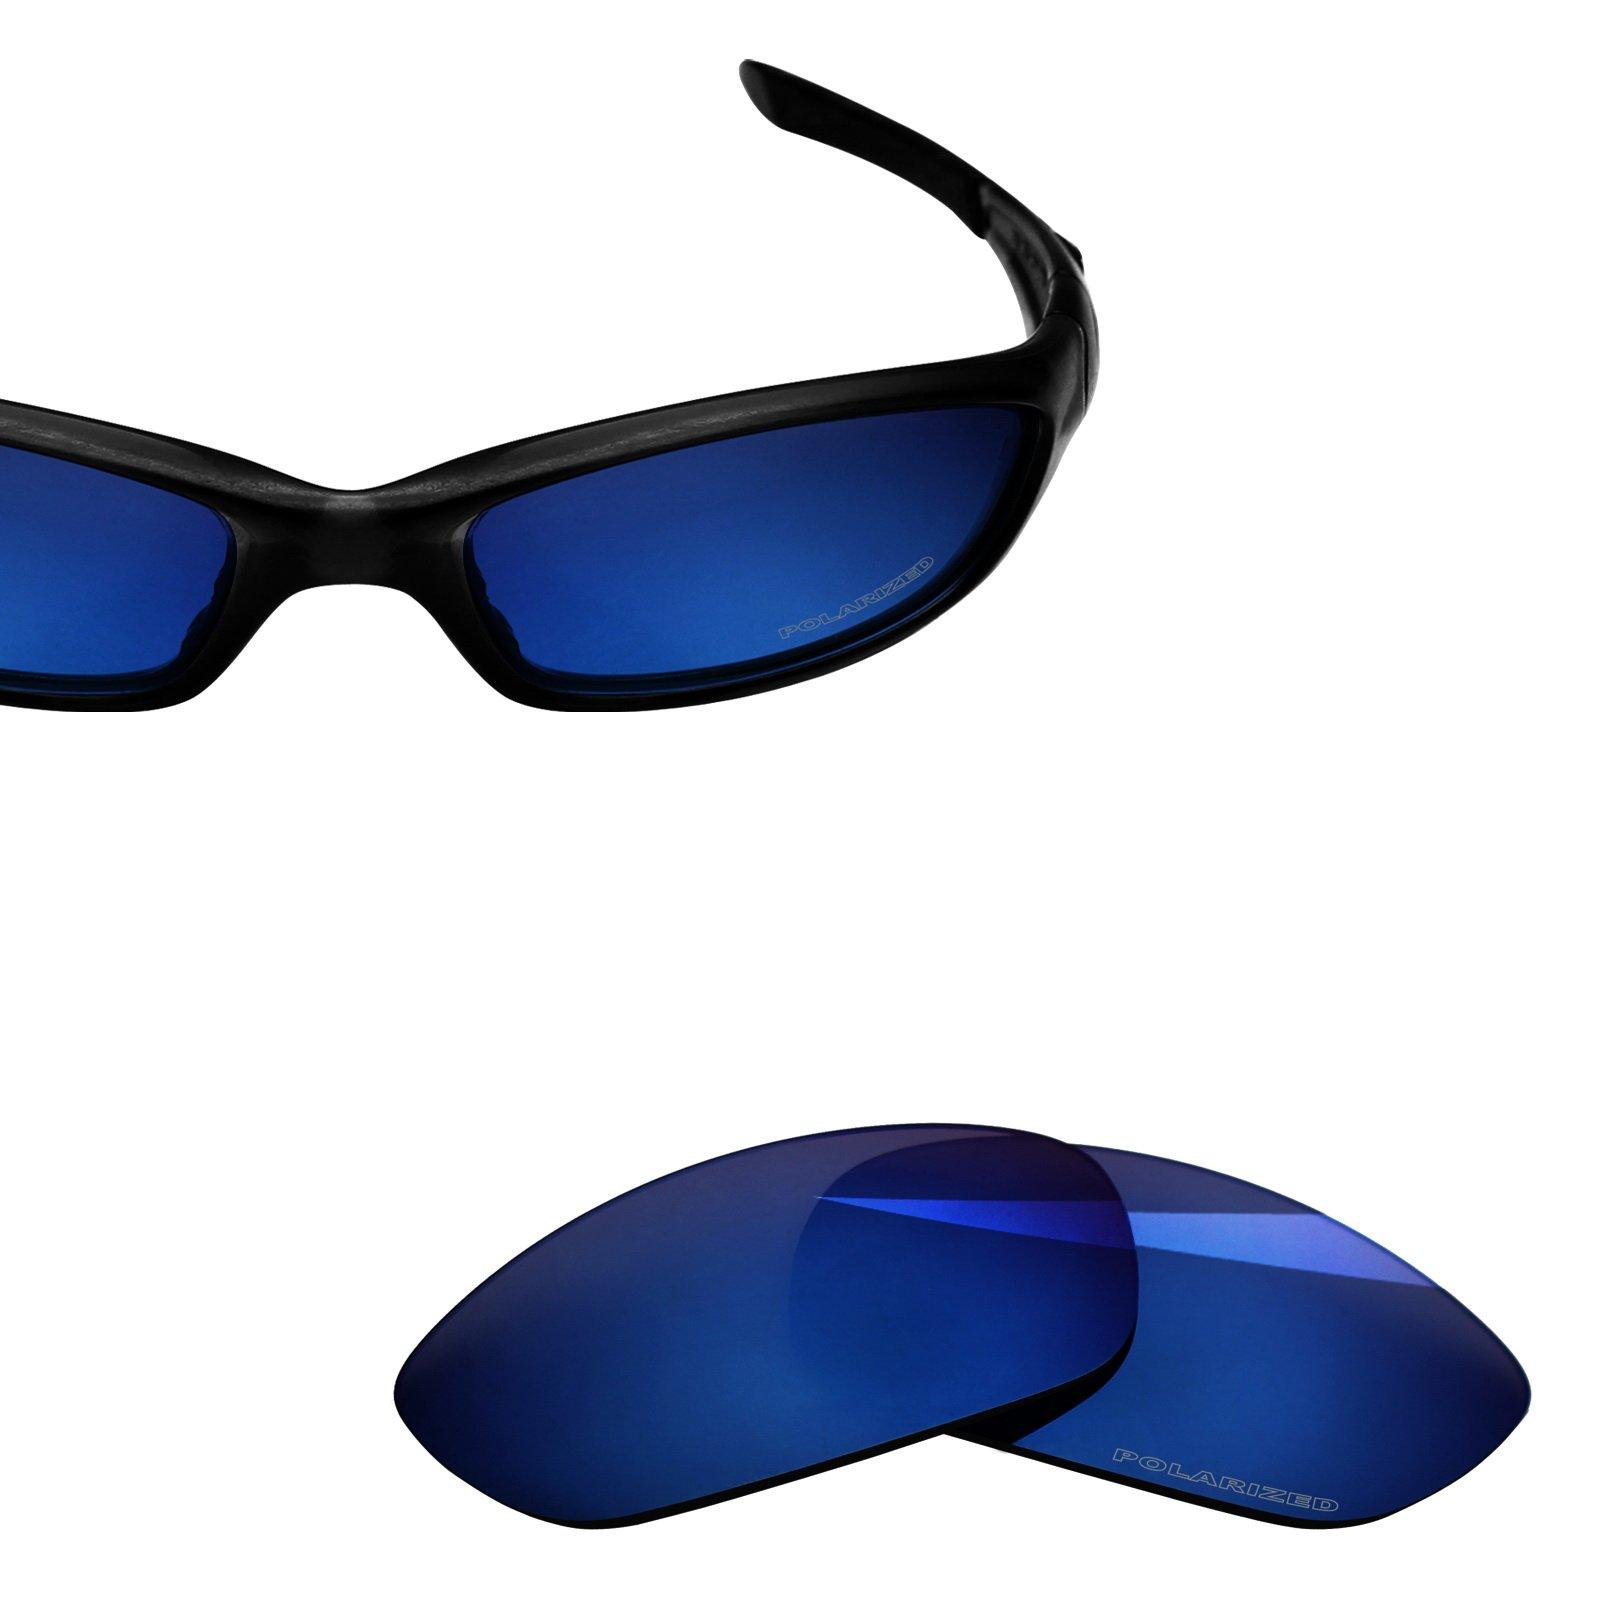 BlazerBuck Anti-salt Polarized Replacement Lenses for Oakley Straight Jacket 2007 - Midnight Blue by BlazerBuck